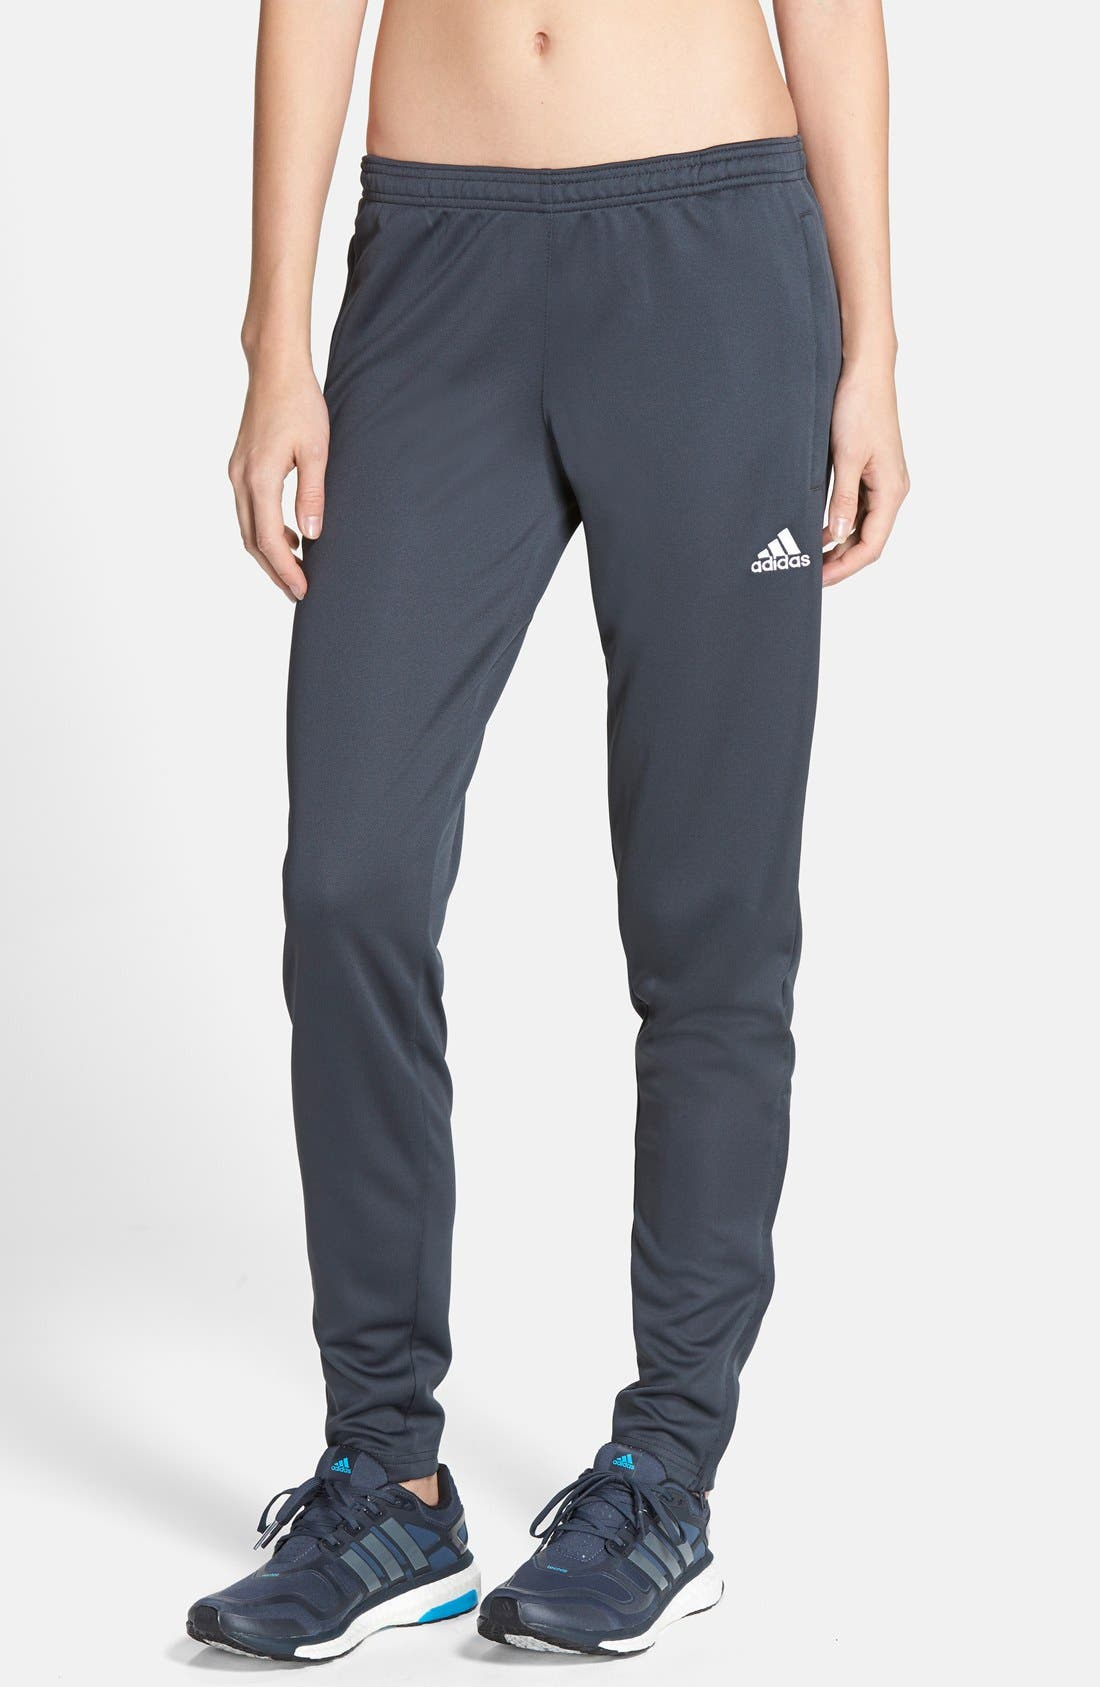 Alternate Image 1 Selected - adidas 'Core 15' CLIMALITE® Training Pants